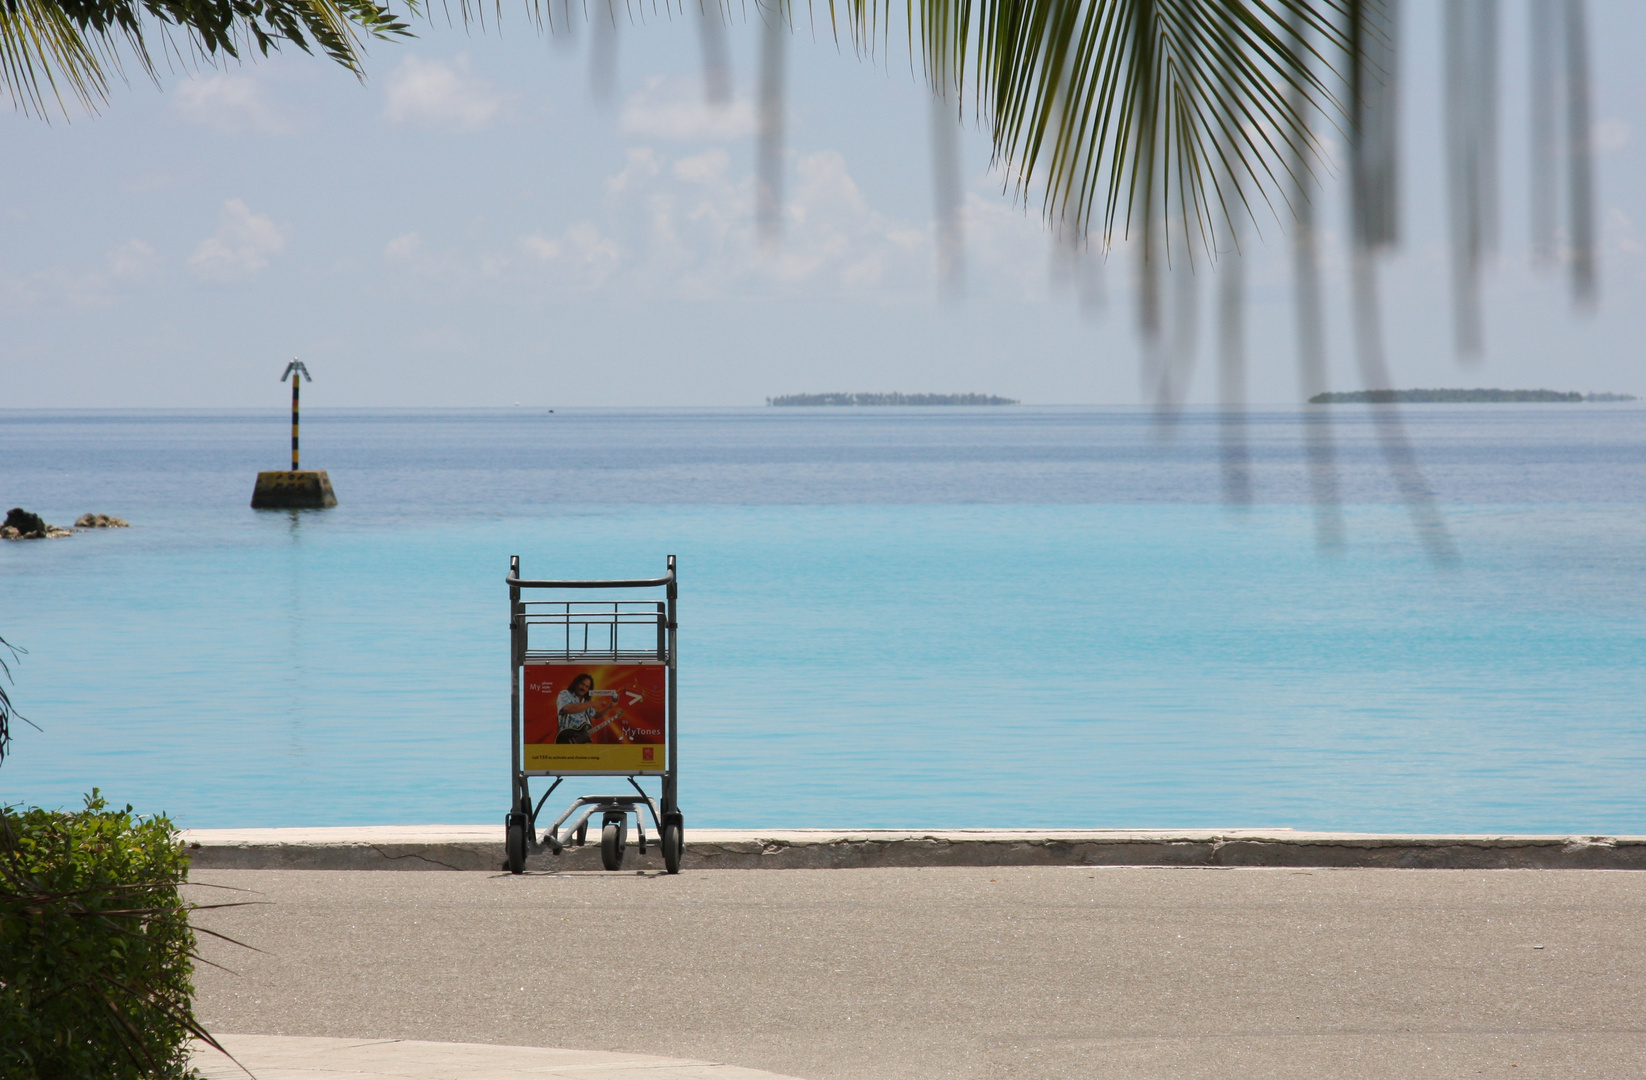 sortie de l'aeroport, Maldives sud